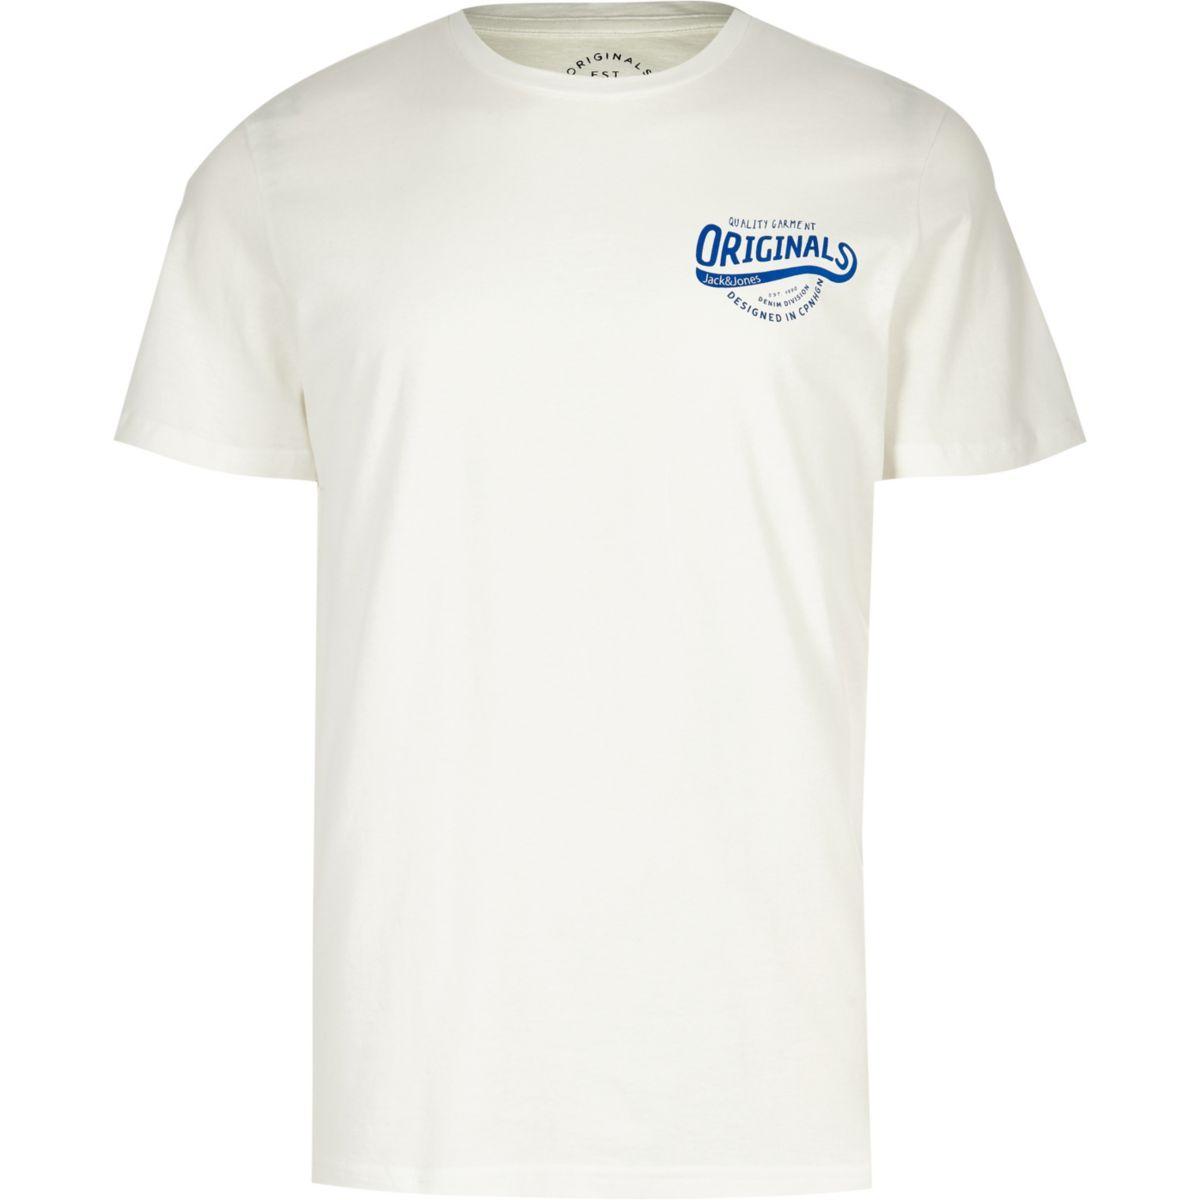 T white amp; Jones print Originals shirt Jack 14awqTnpW4